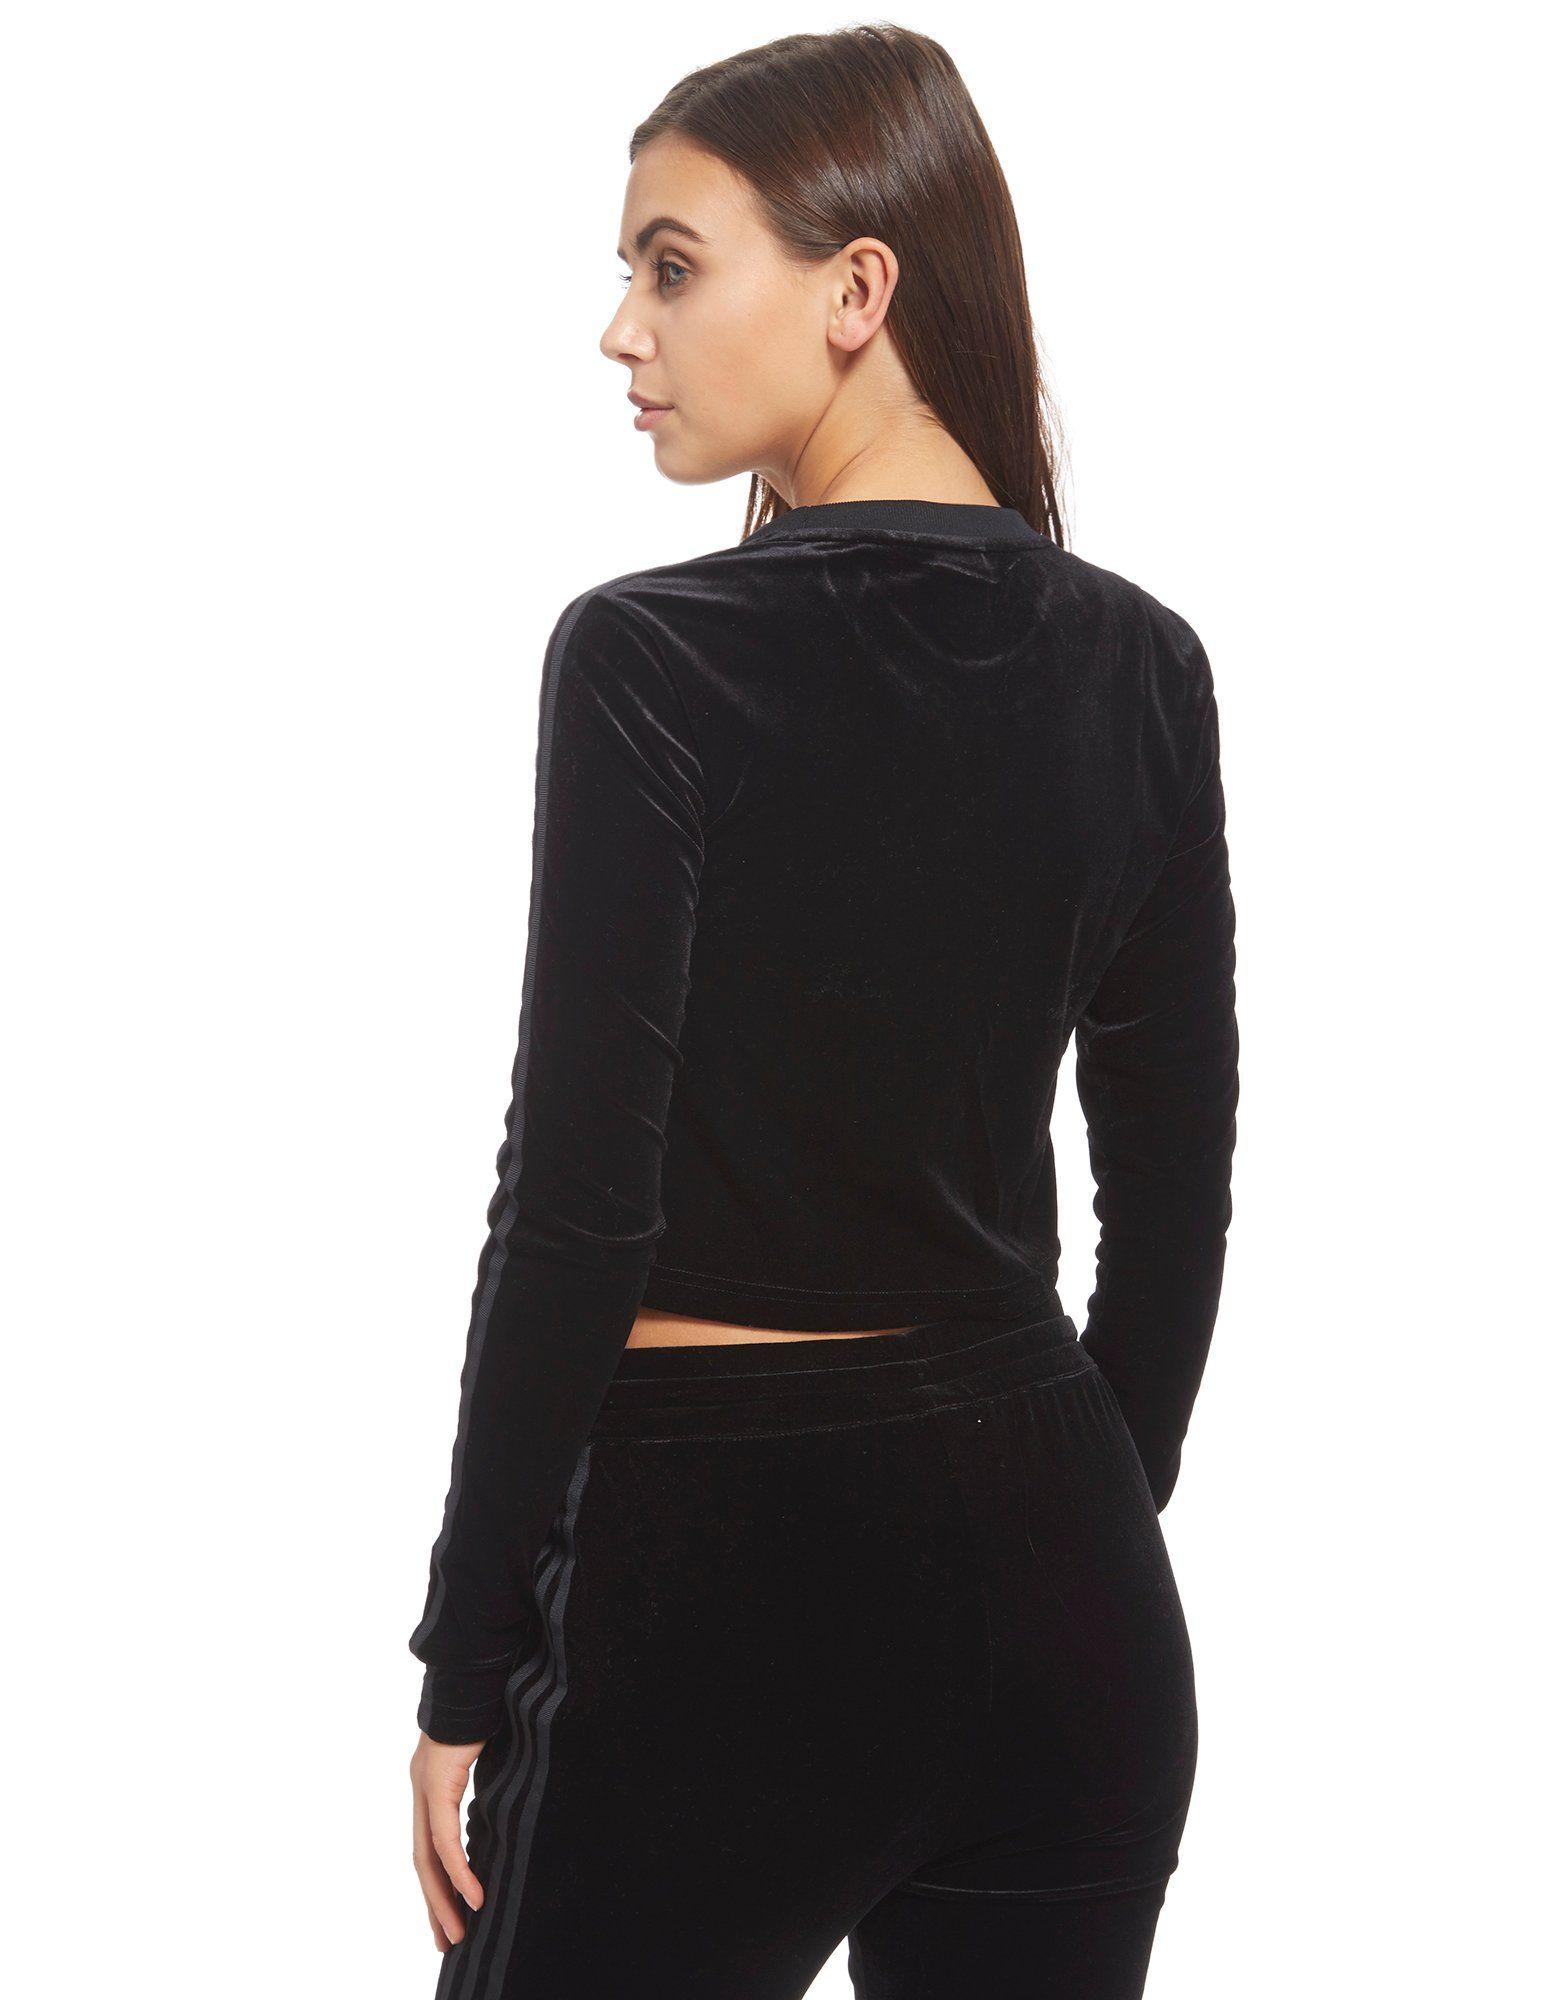 adidas Originals Velvet Vibes Long Sleeve Crop Top